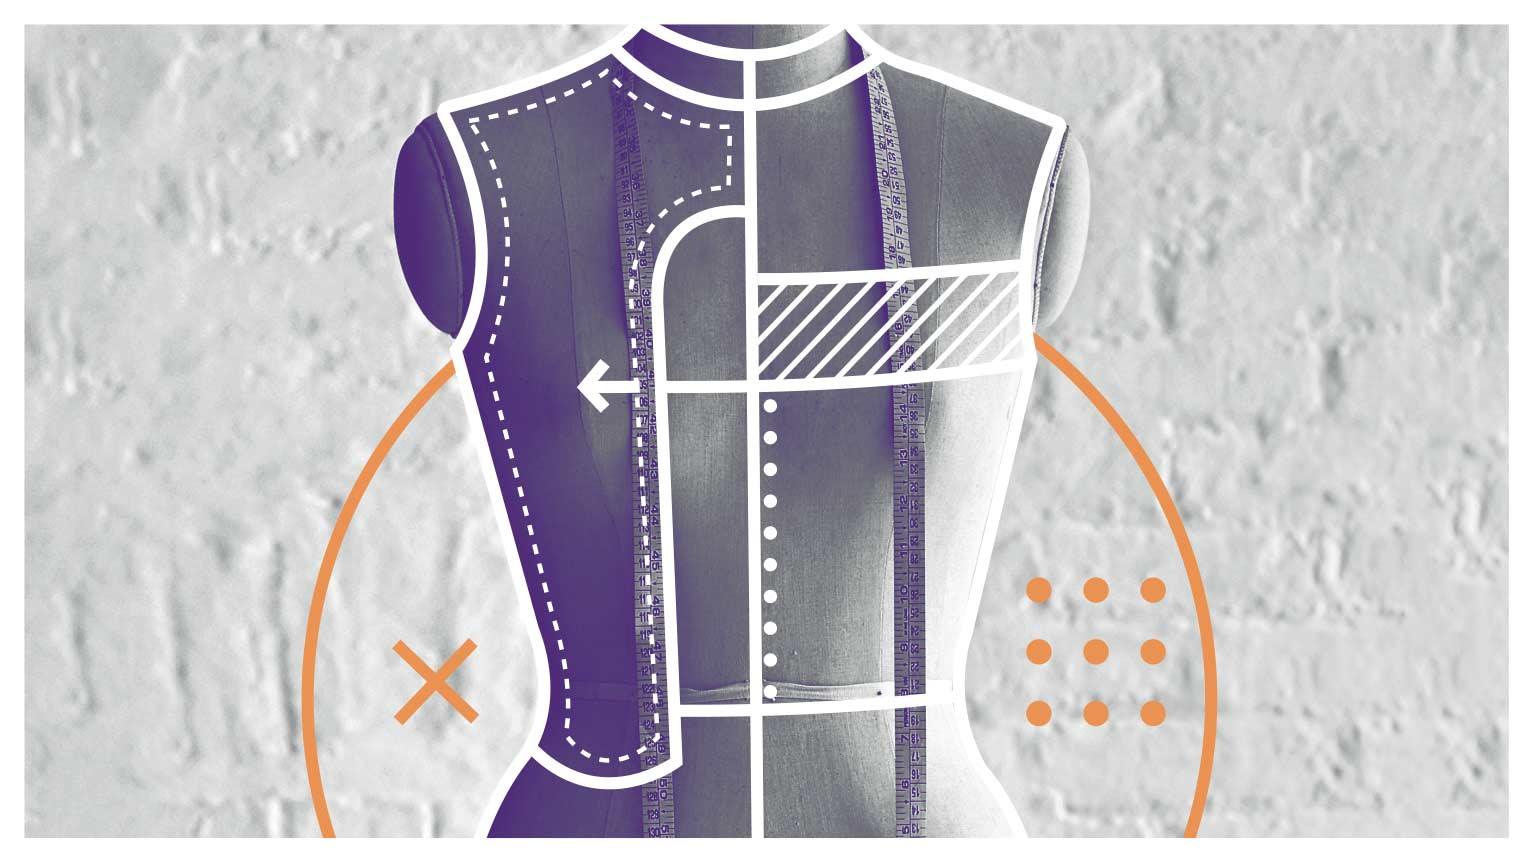 معارفه و ورکشاپ دوره الگوسازی و دوخت پوشاک زنانه به روش مولاژ